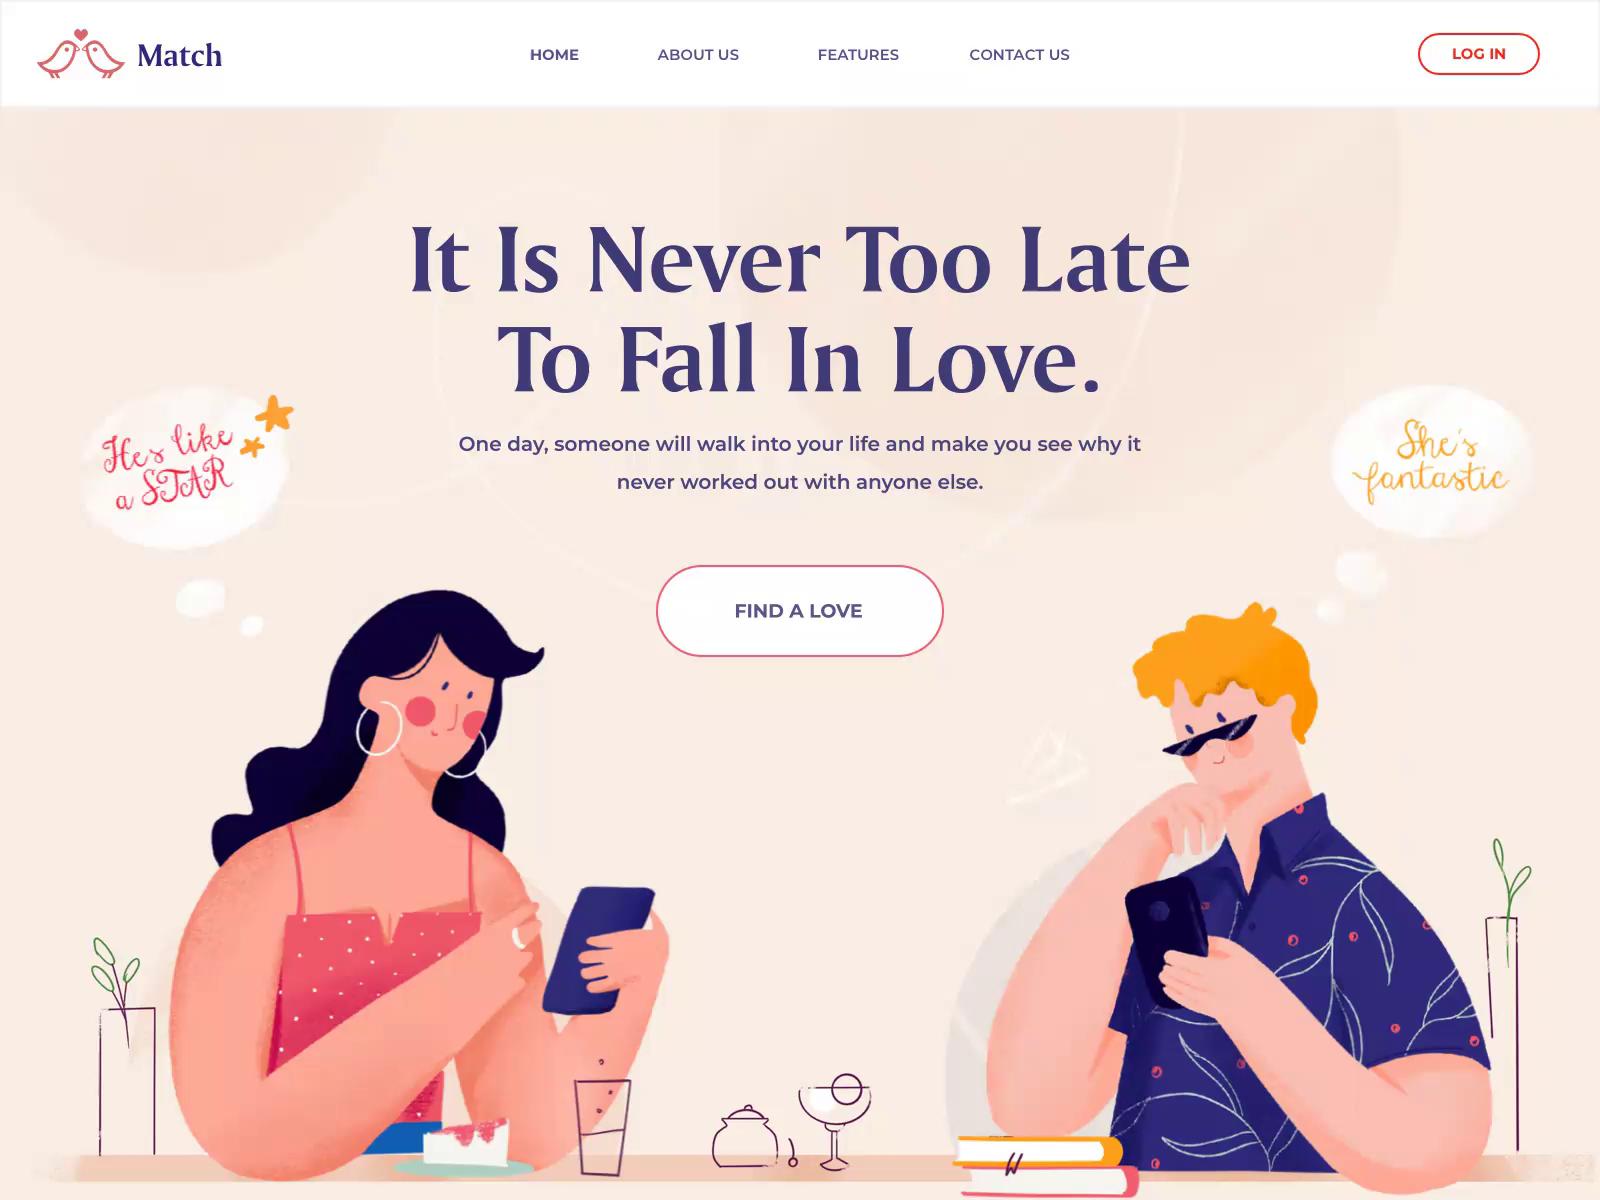 Brenda dating website